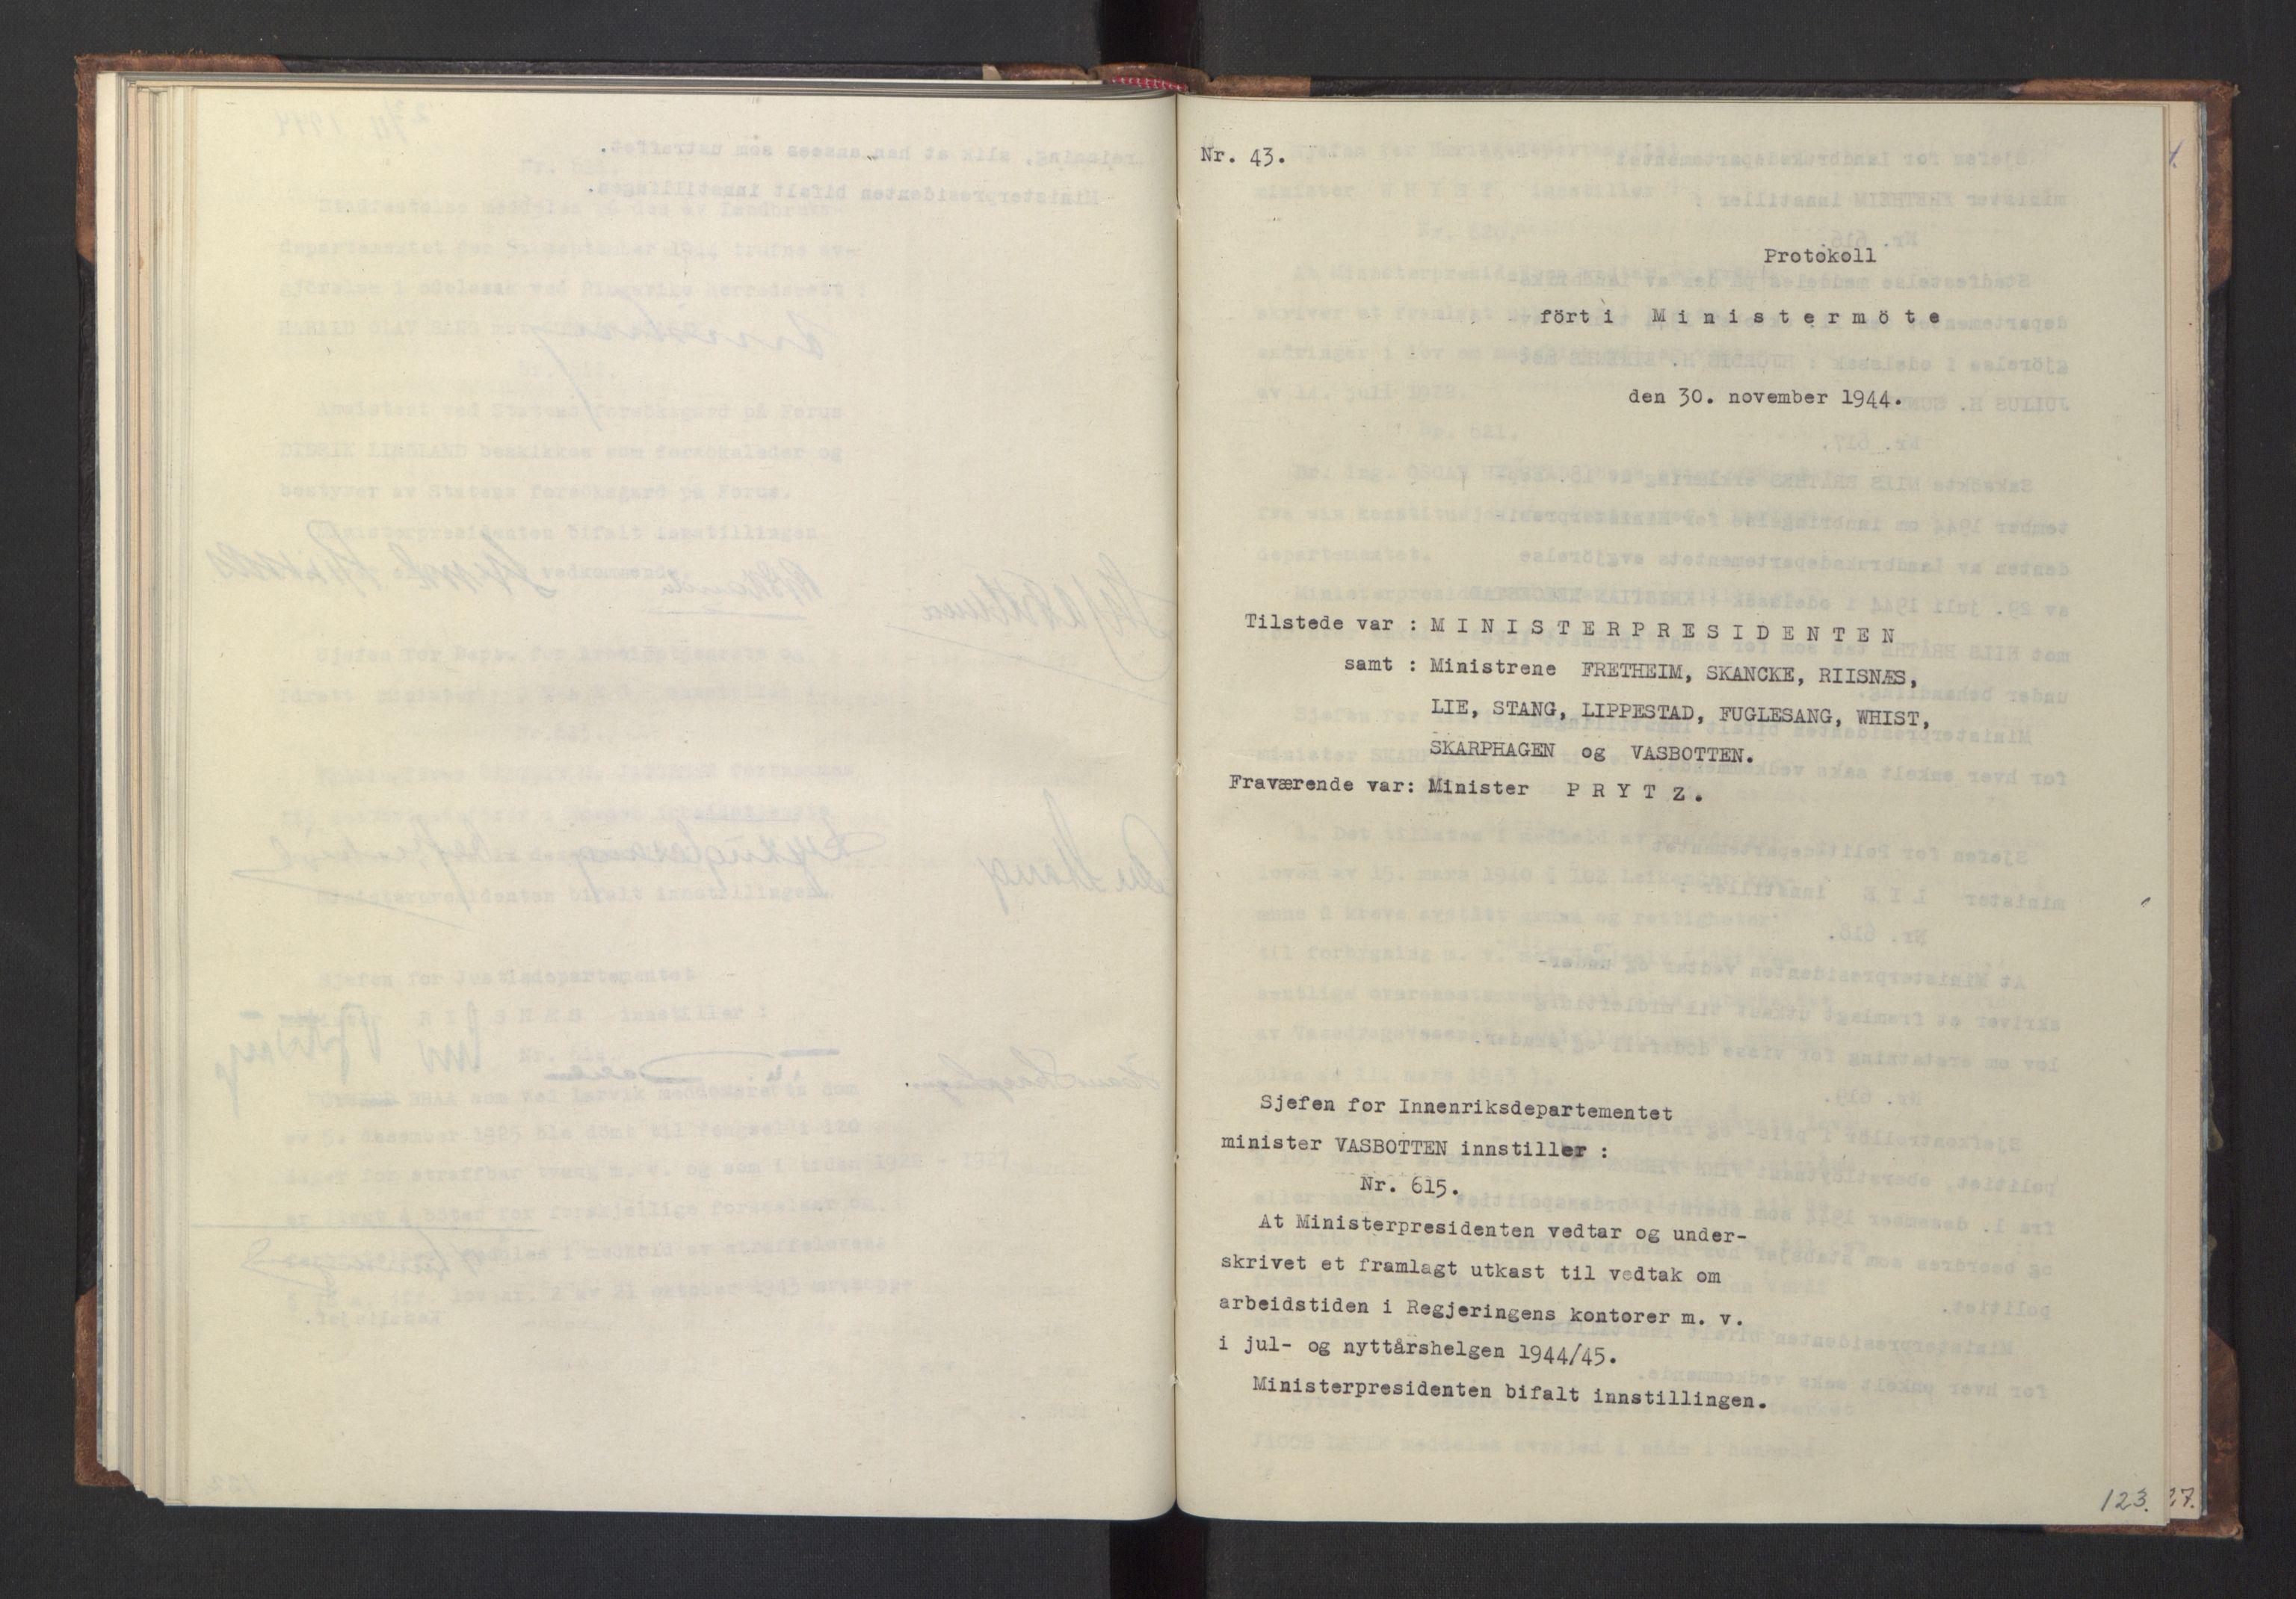 RA, NS-administrasjonen 1940-1945 (Statsrådsekretariatet, de kommisariske statsråder mm), D/Da/L0005: Protokoll fra ministermøter, 1944, s. 122b-123a